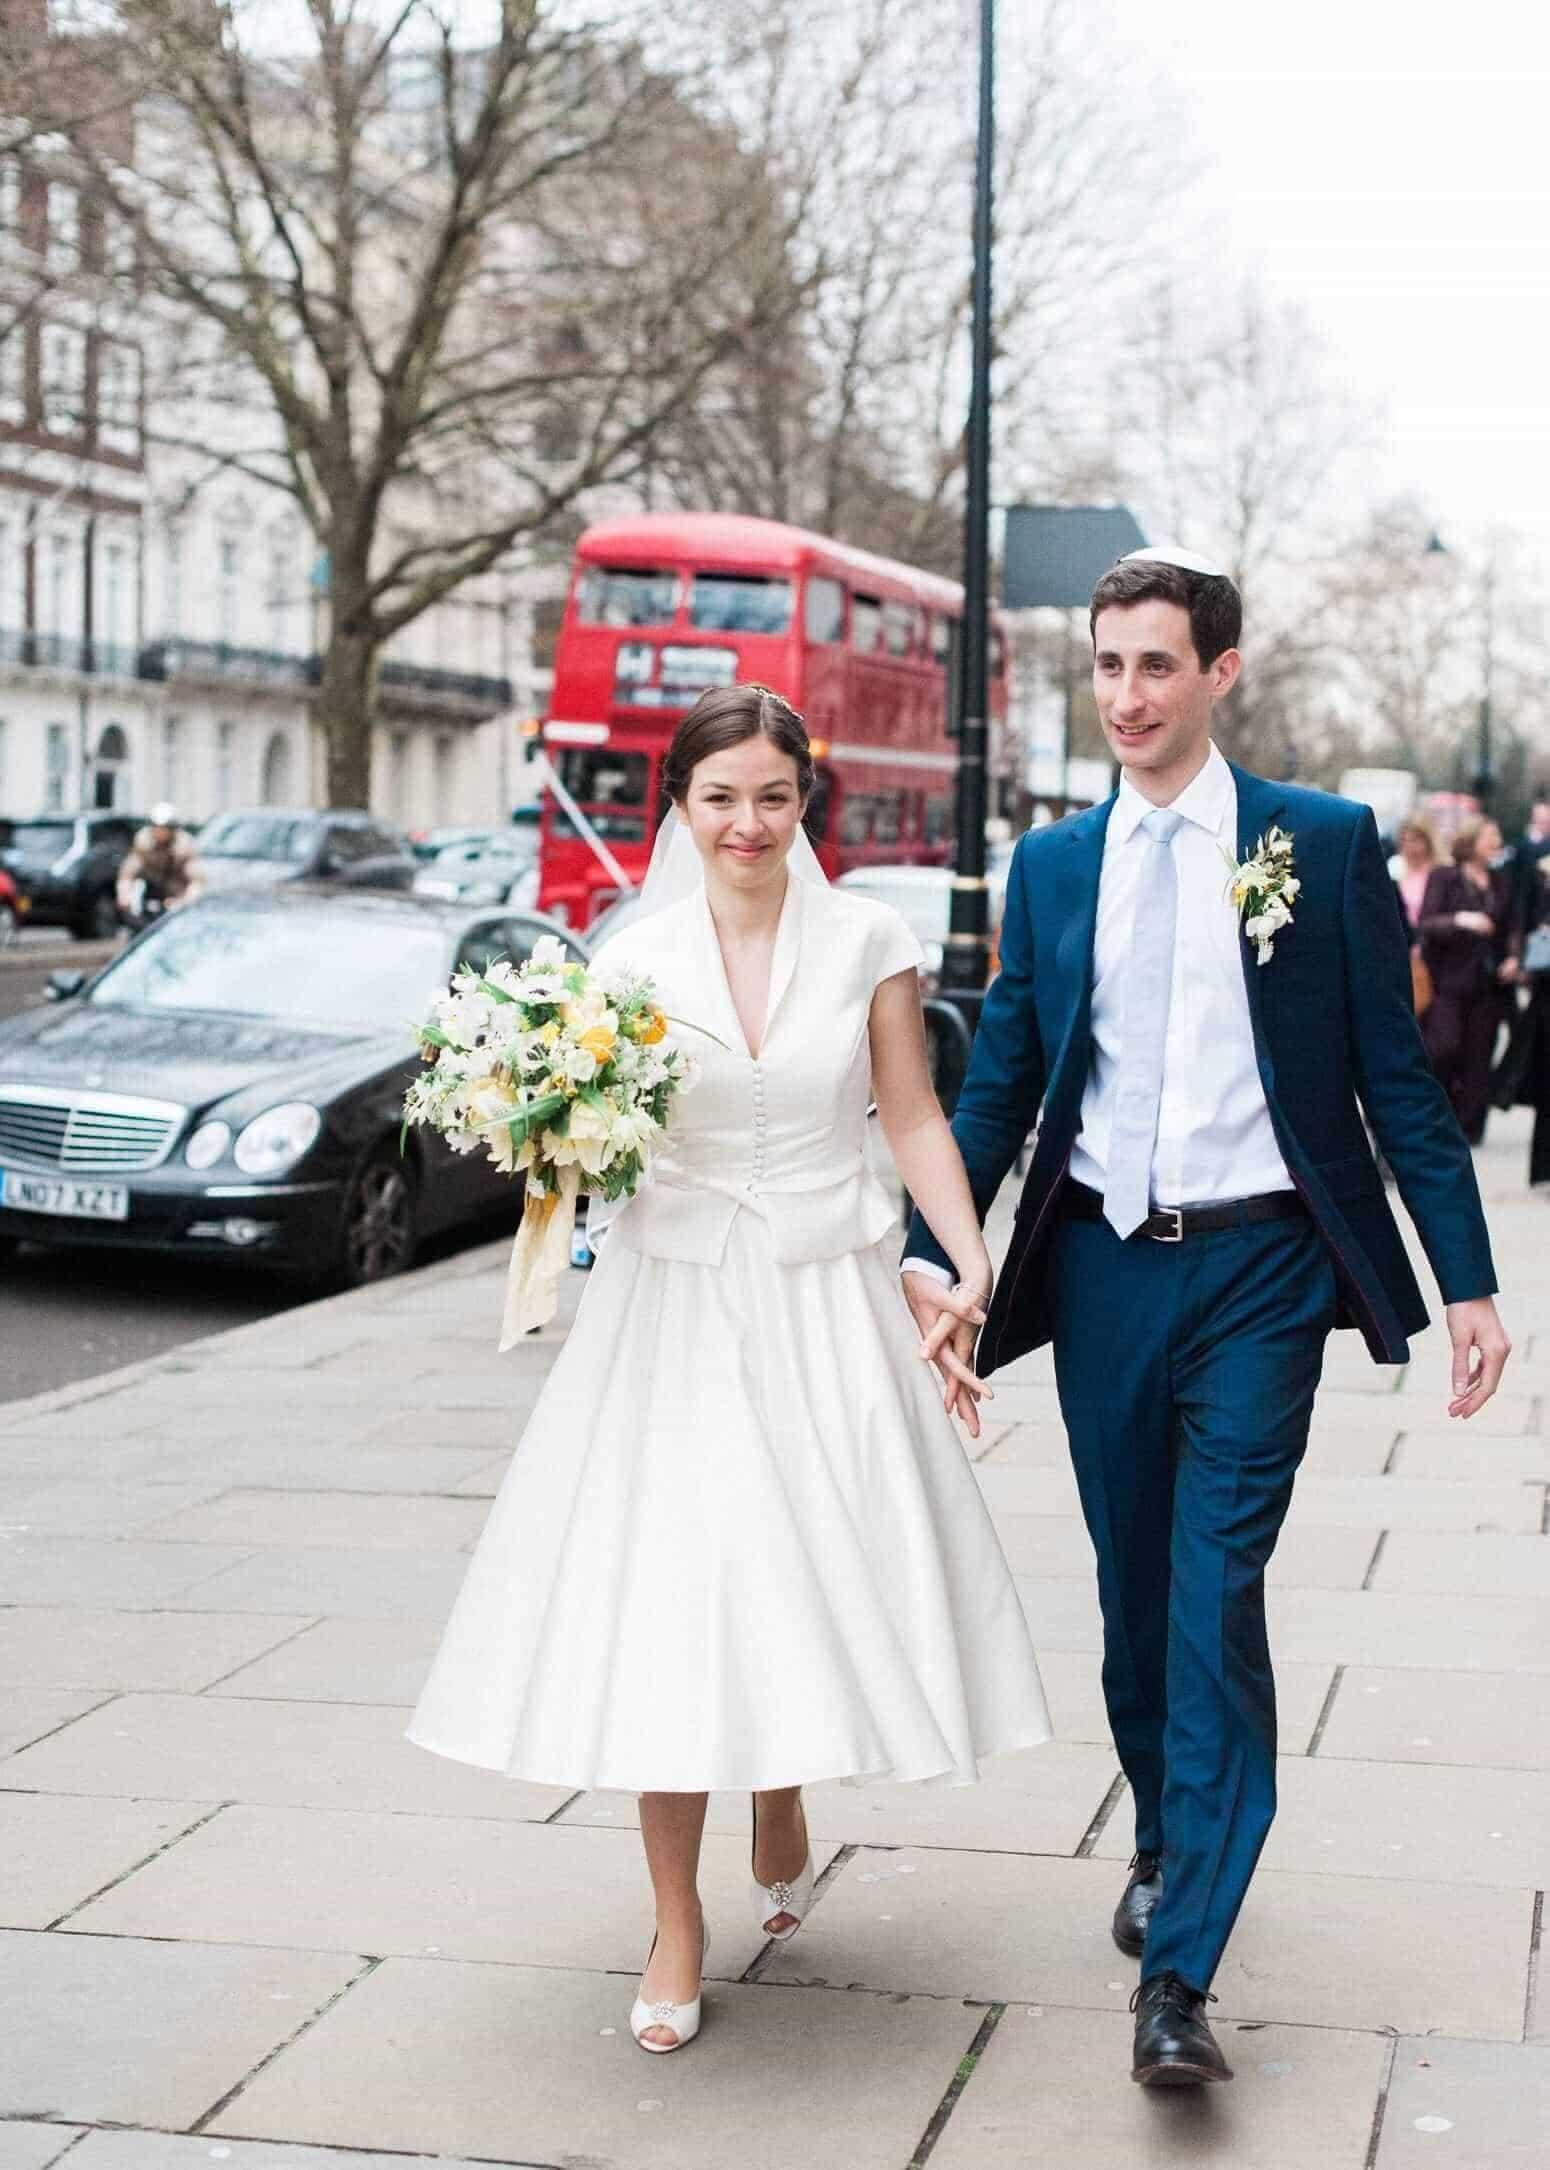 RIBA jewish wedding Kate Nielen Photography 153 - Luxury Wedding Gallery